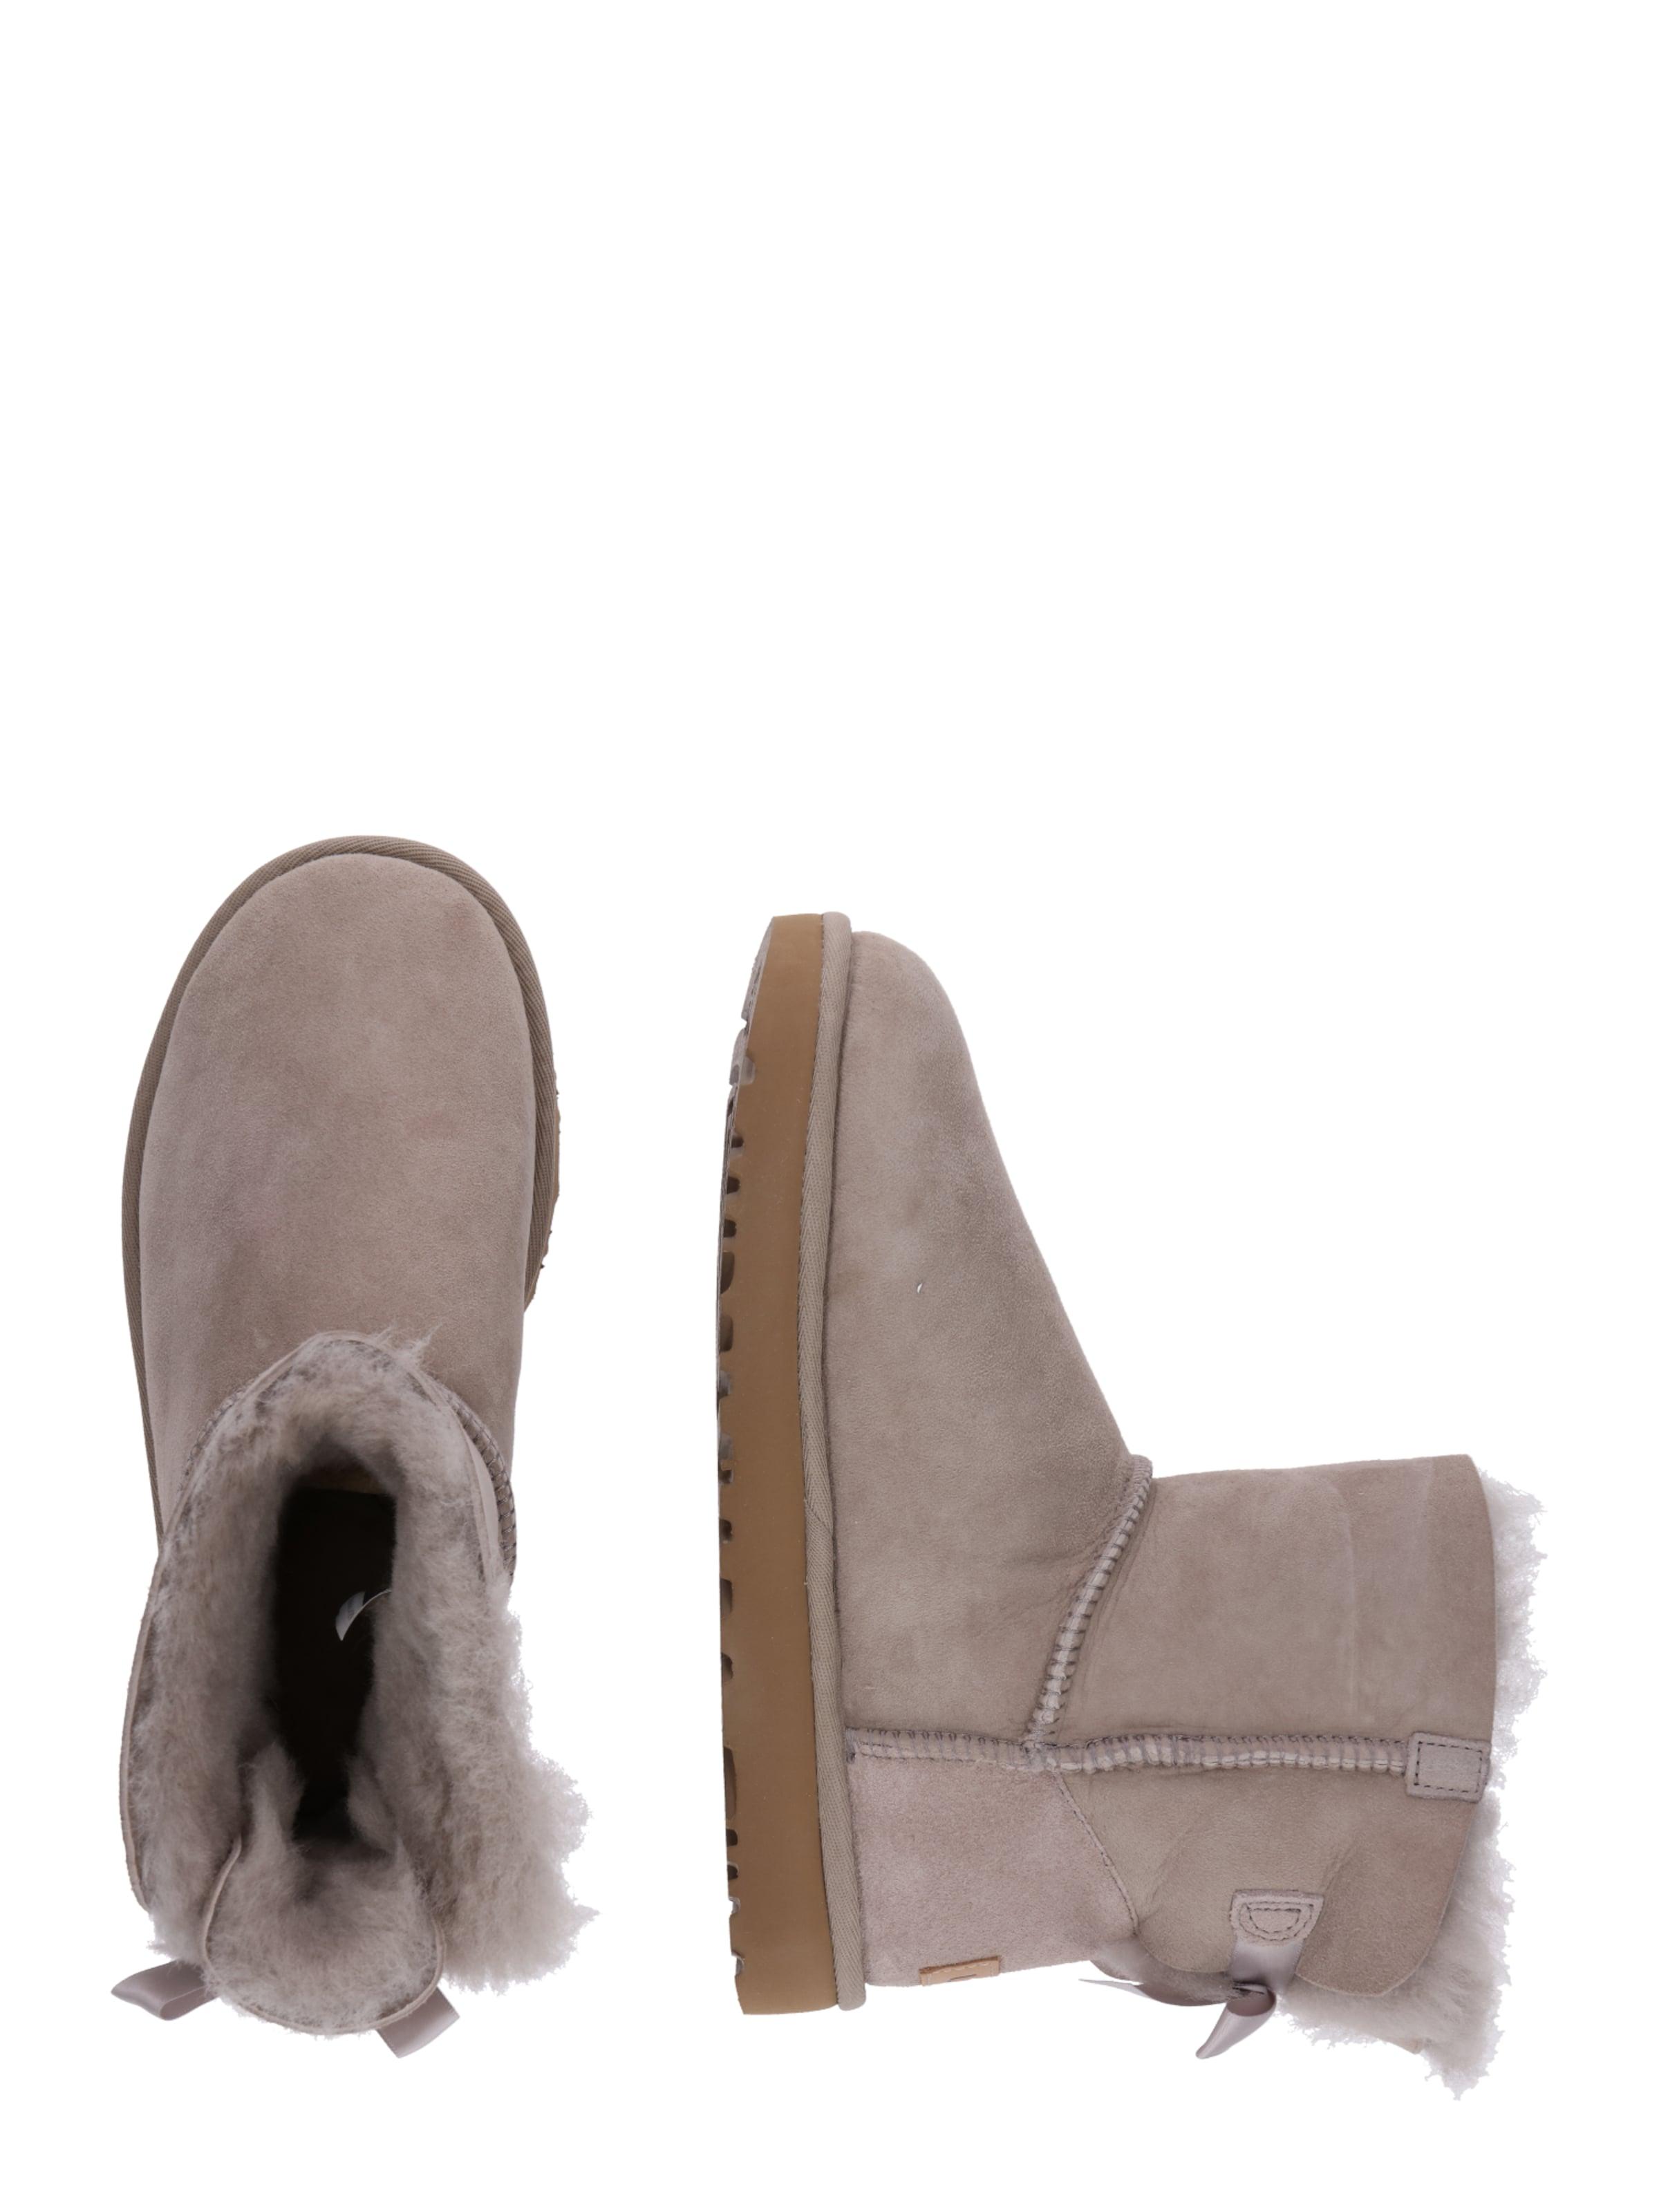 Bow En Ugg 'mini Ii' Boots Gris Bailey Ivf6g7Yby